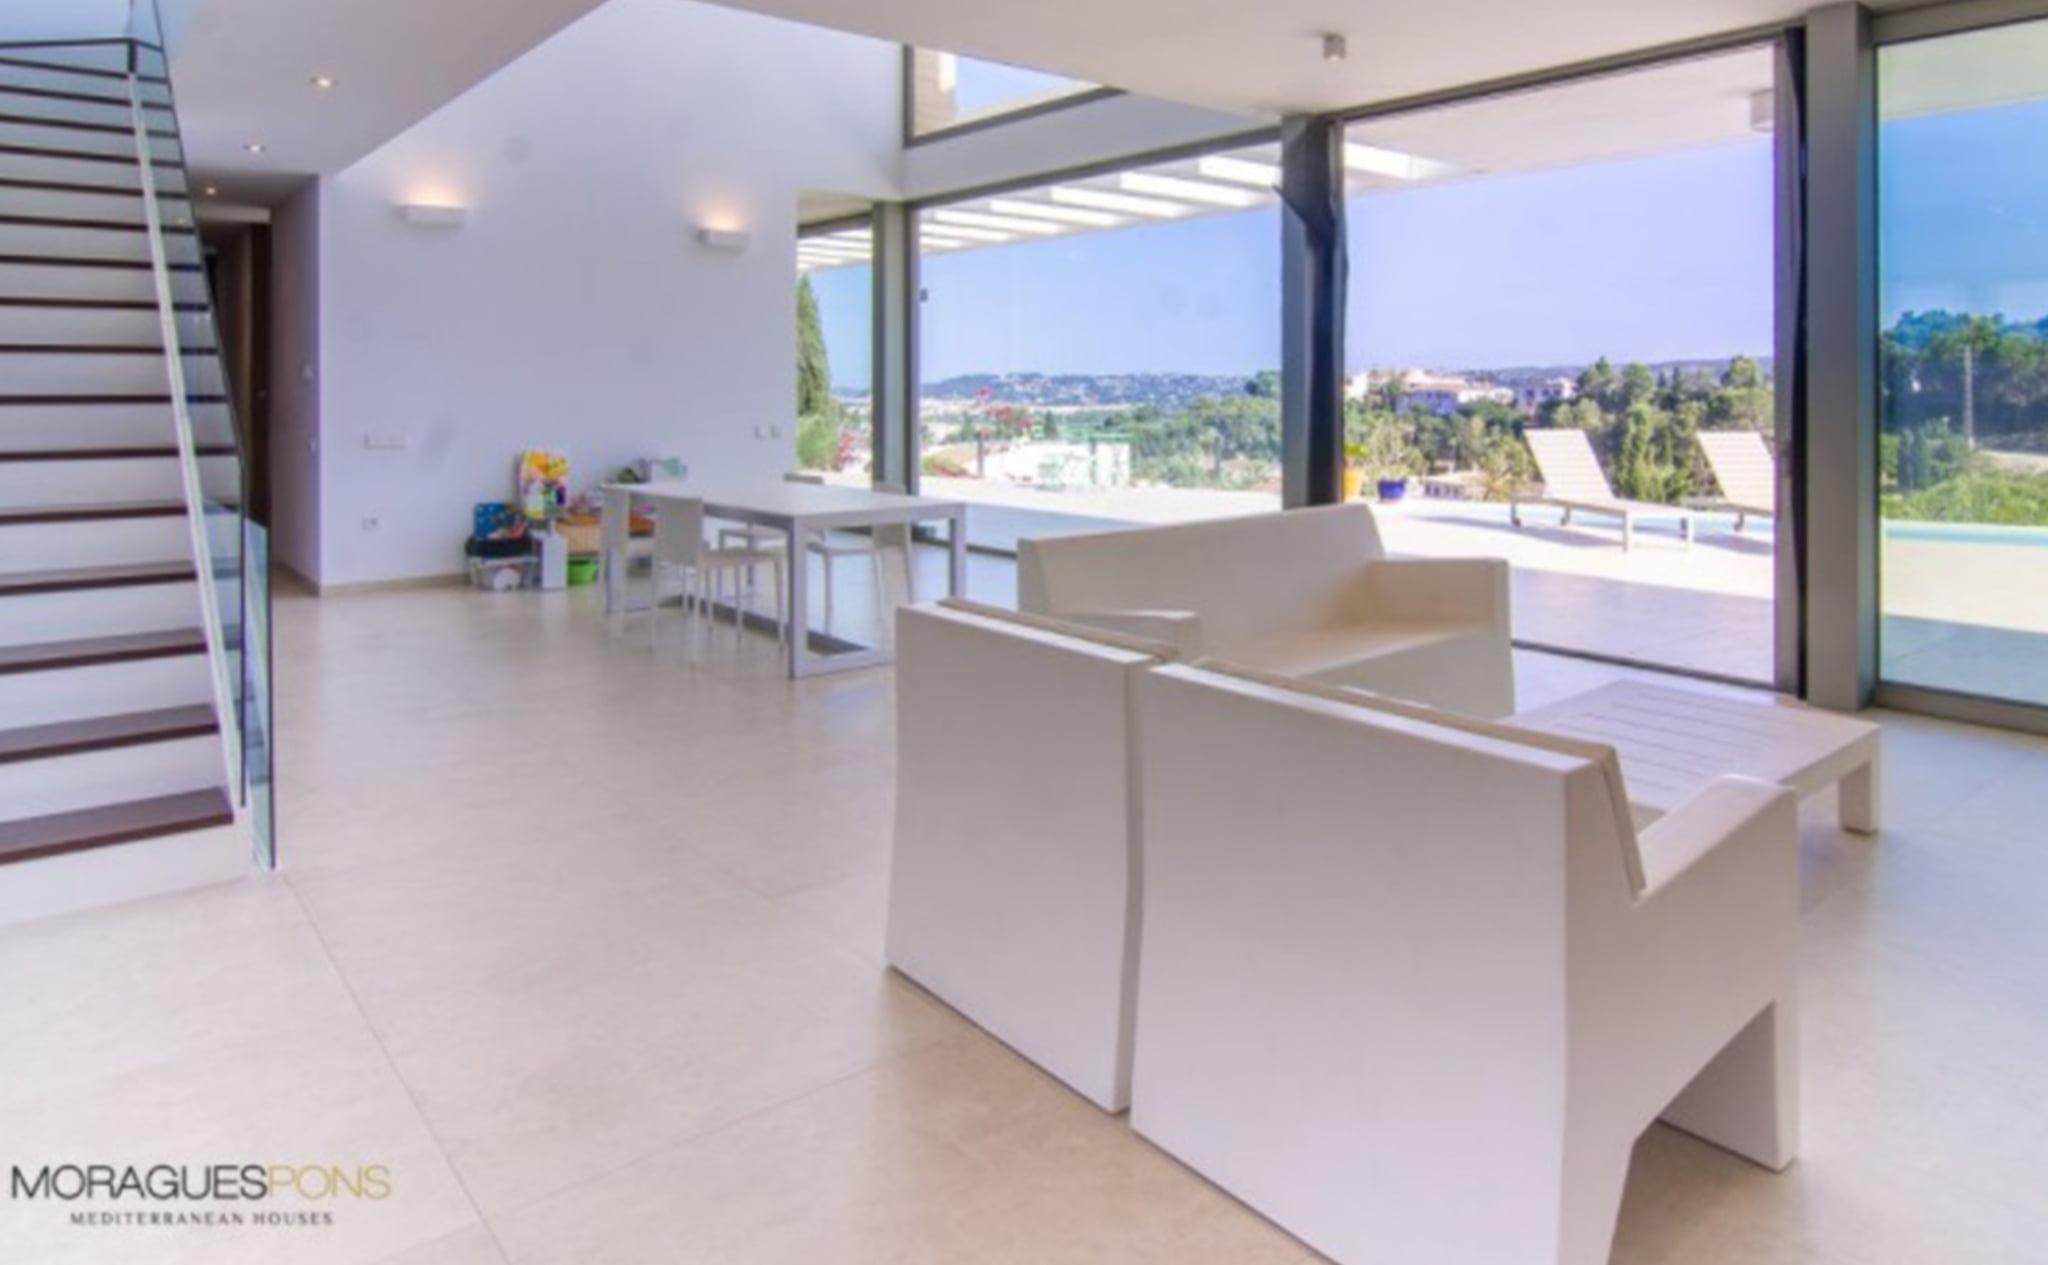 Saló de una casa moderna en venta en Jávea – MORAGUESPONS Mediterranean Houses